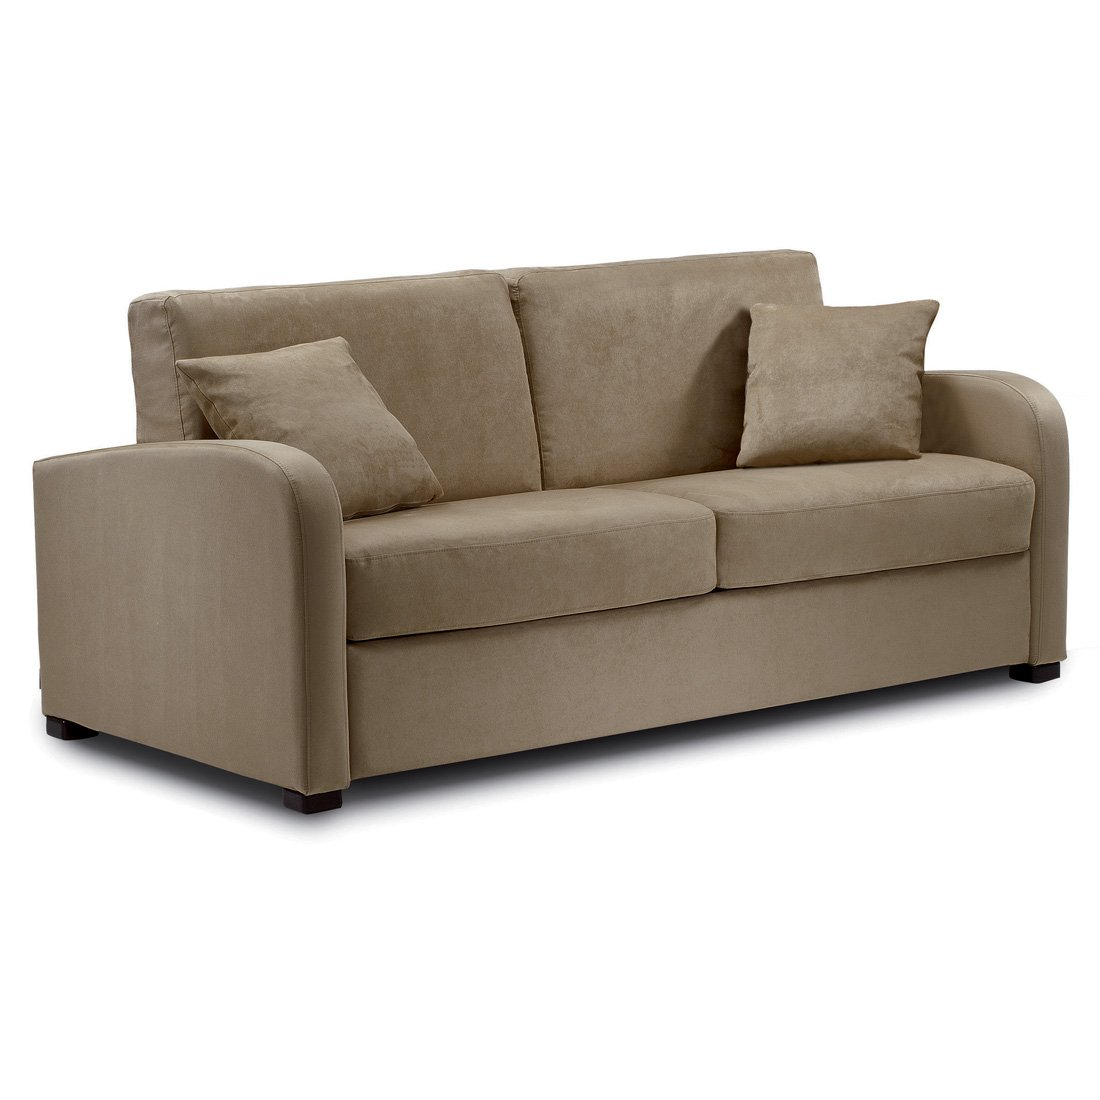 Canap convertible chatillon meubles et atmosph re for Canape convertible et fauteuil assorti